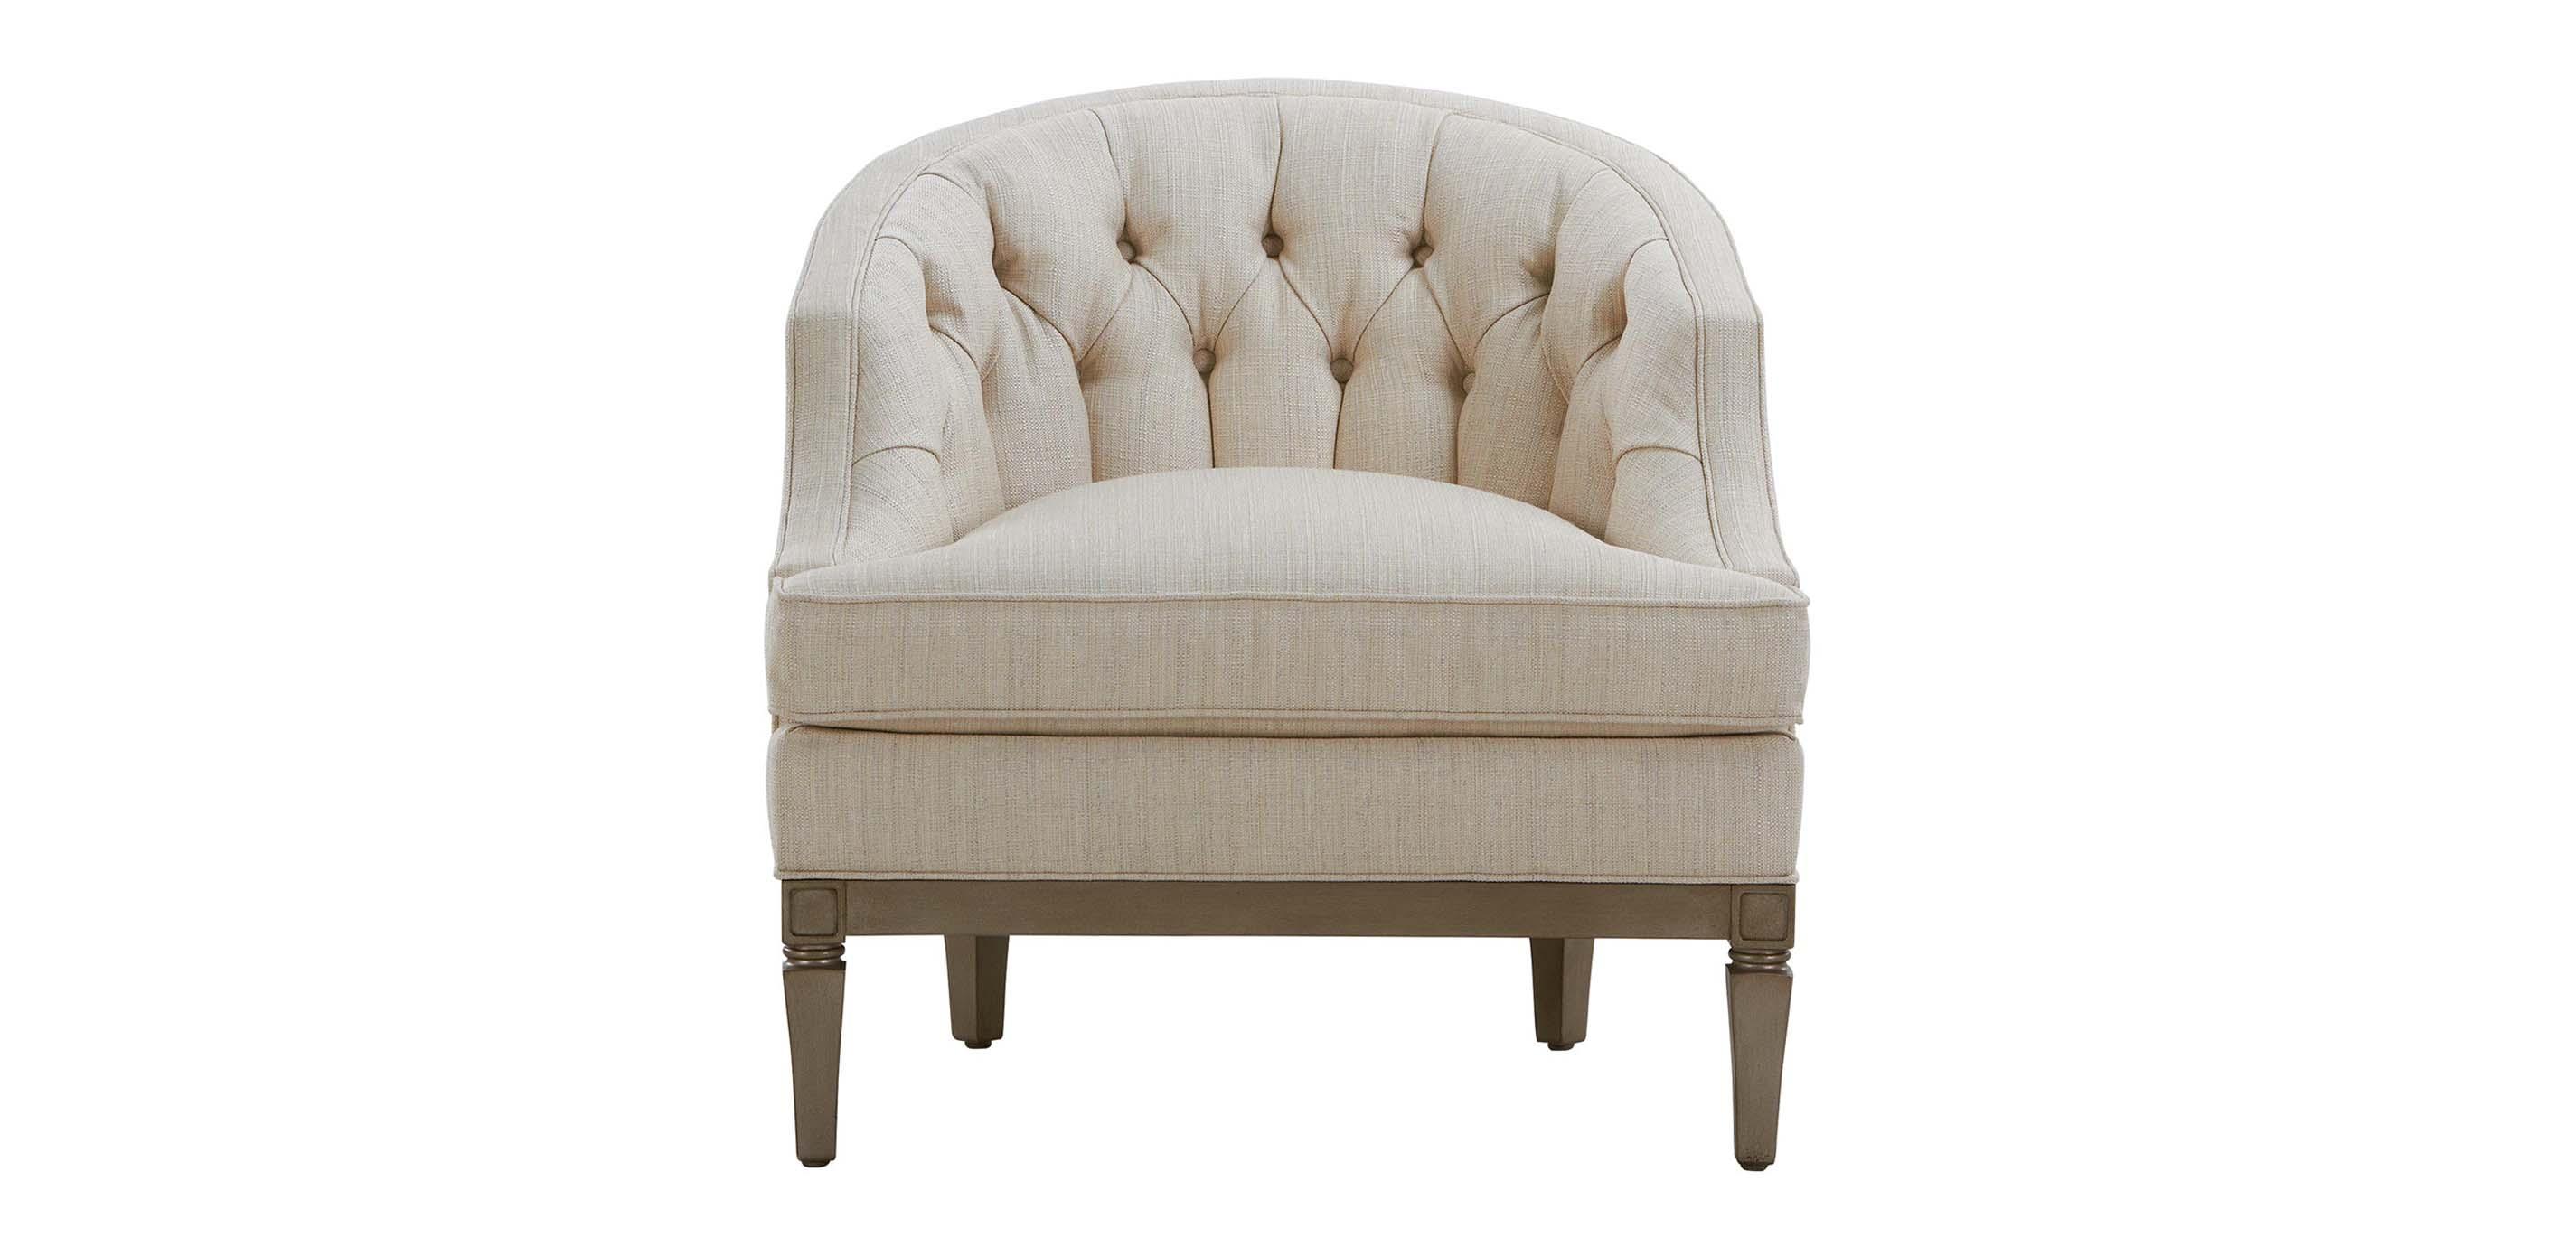 Beckett Chair   Chairs & Chaises   Ethan Allen